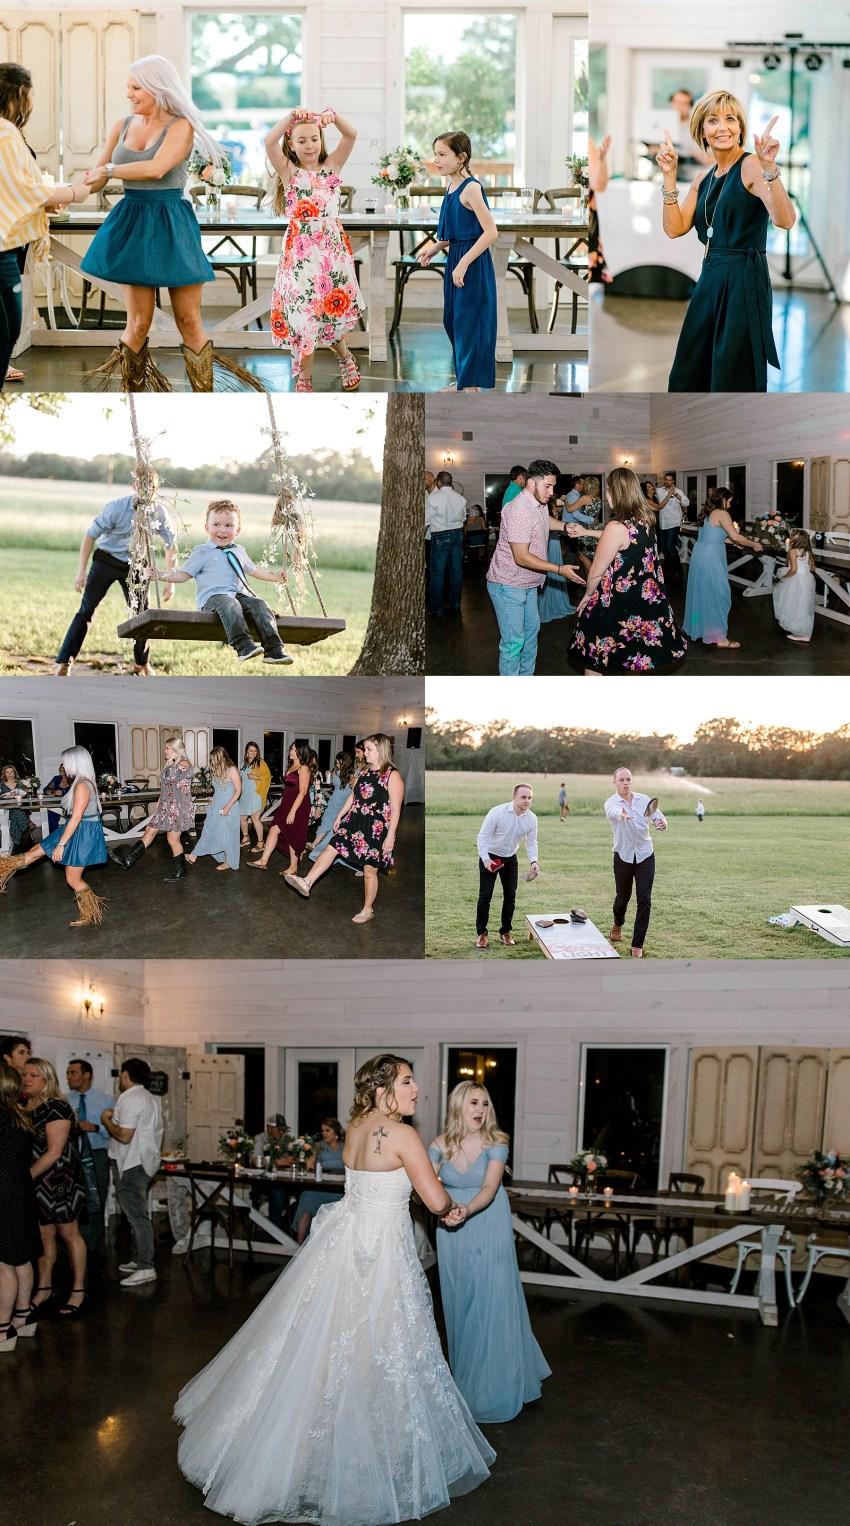 Rustic Chic Spring Wedding (Emory, Texas)   Becca Sue Photography - www.beccasuephotography.com